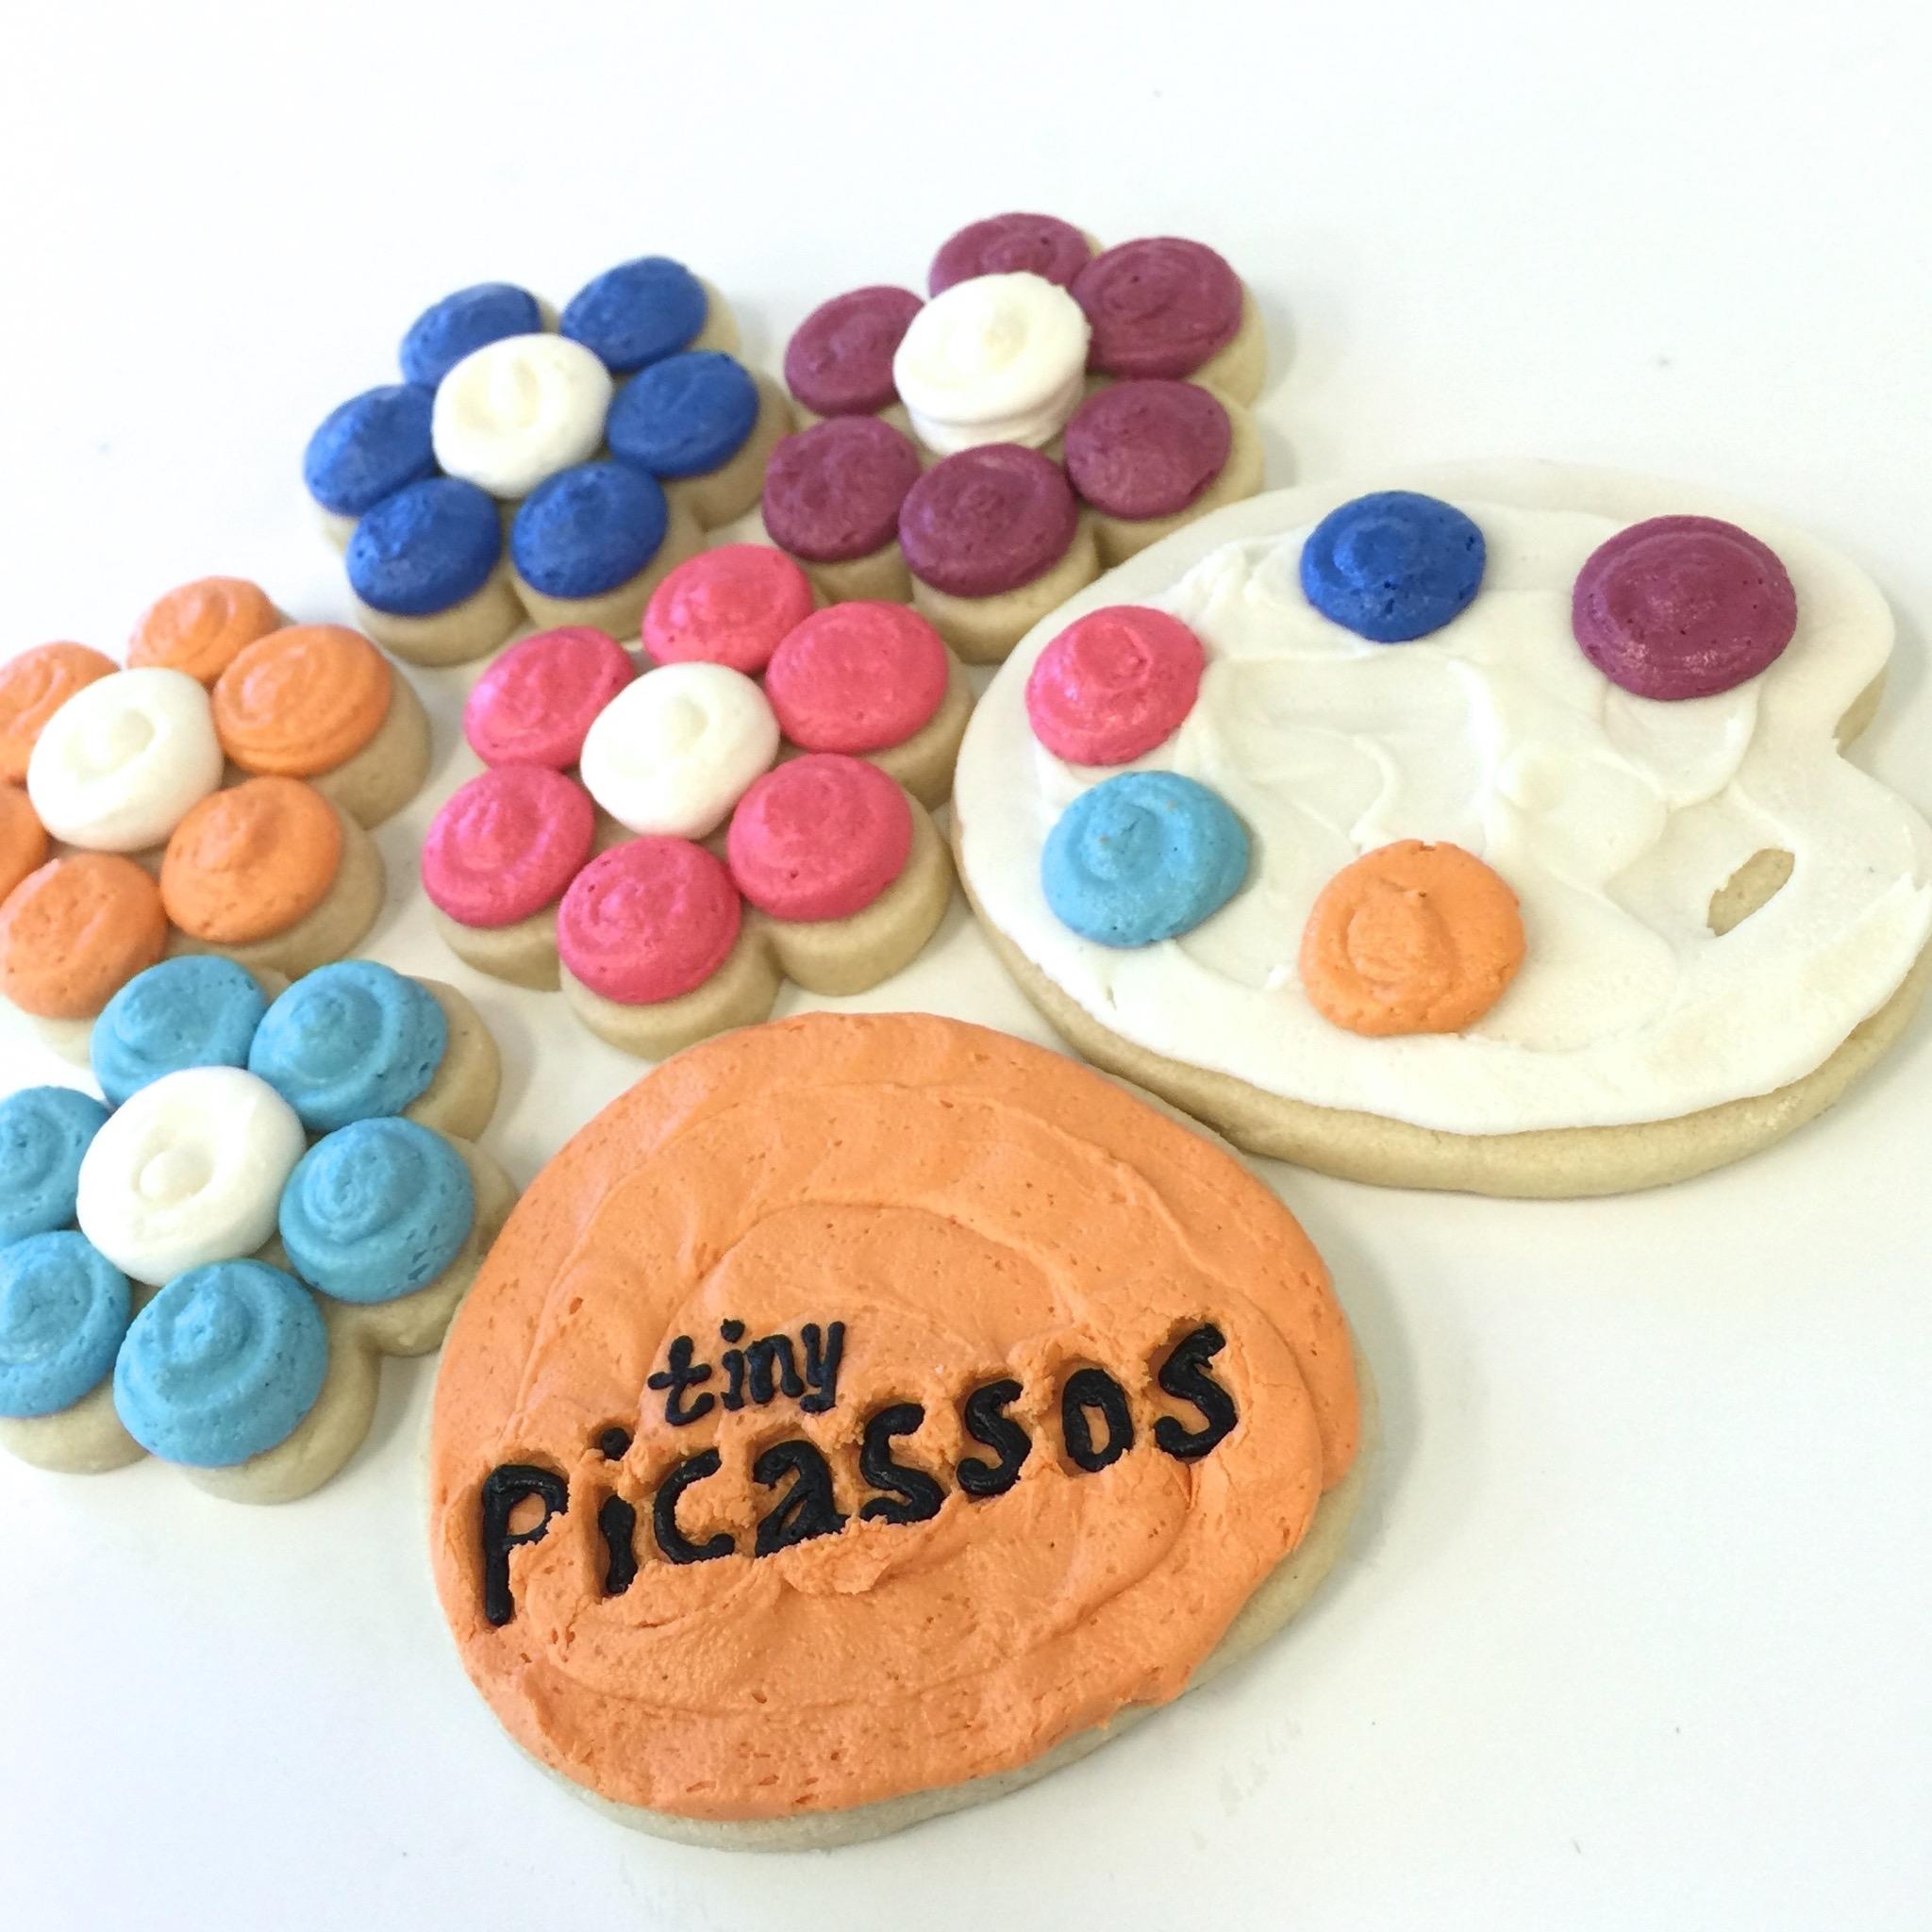 Tiny.Picassos.Cookies.jpg